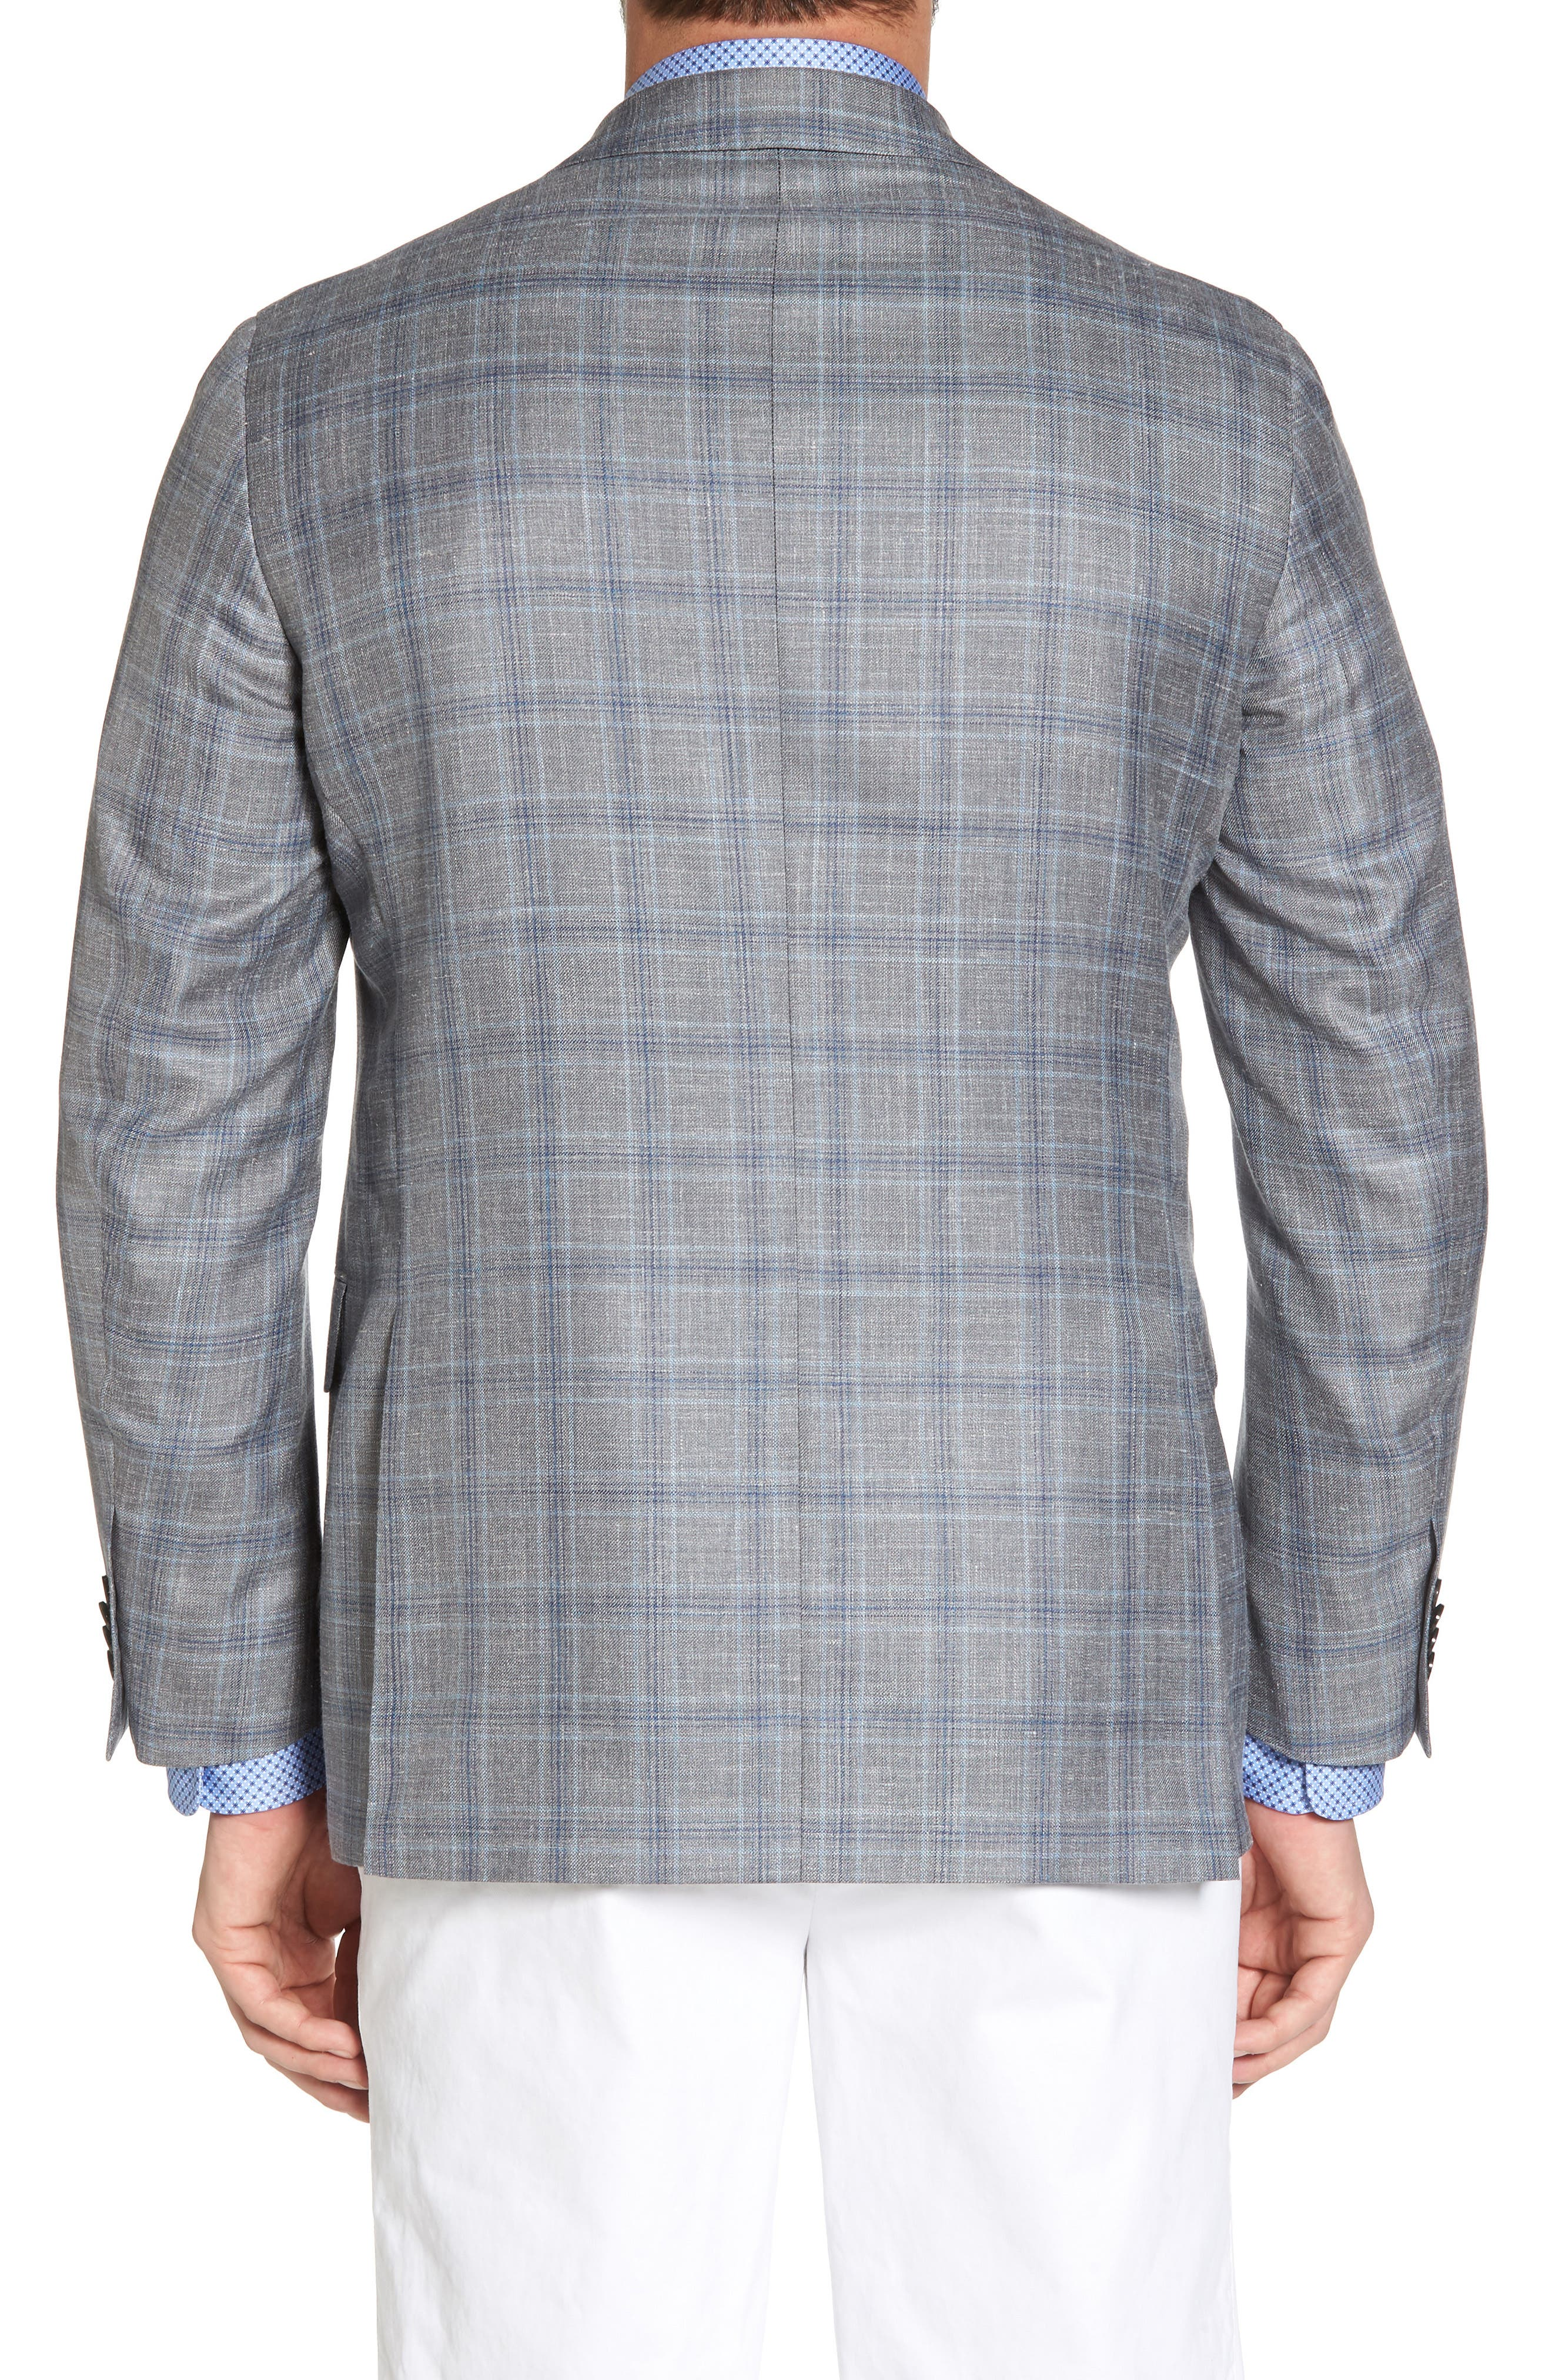 Arnold Classic Fit Plaid Wool Blend Sport Coat,                             Alternate thumbnail 2, color,                             020